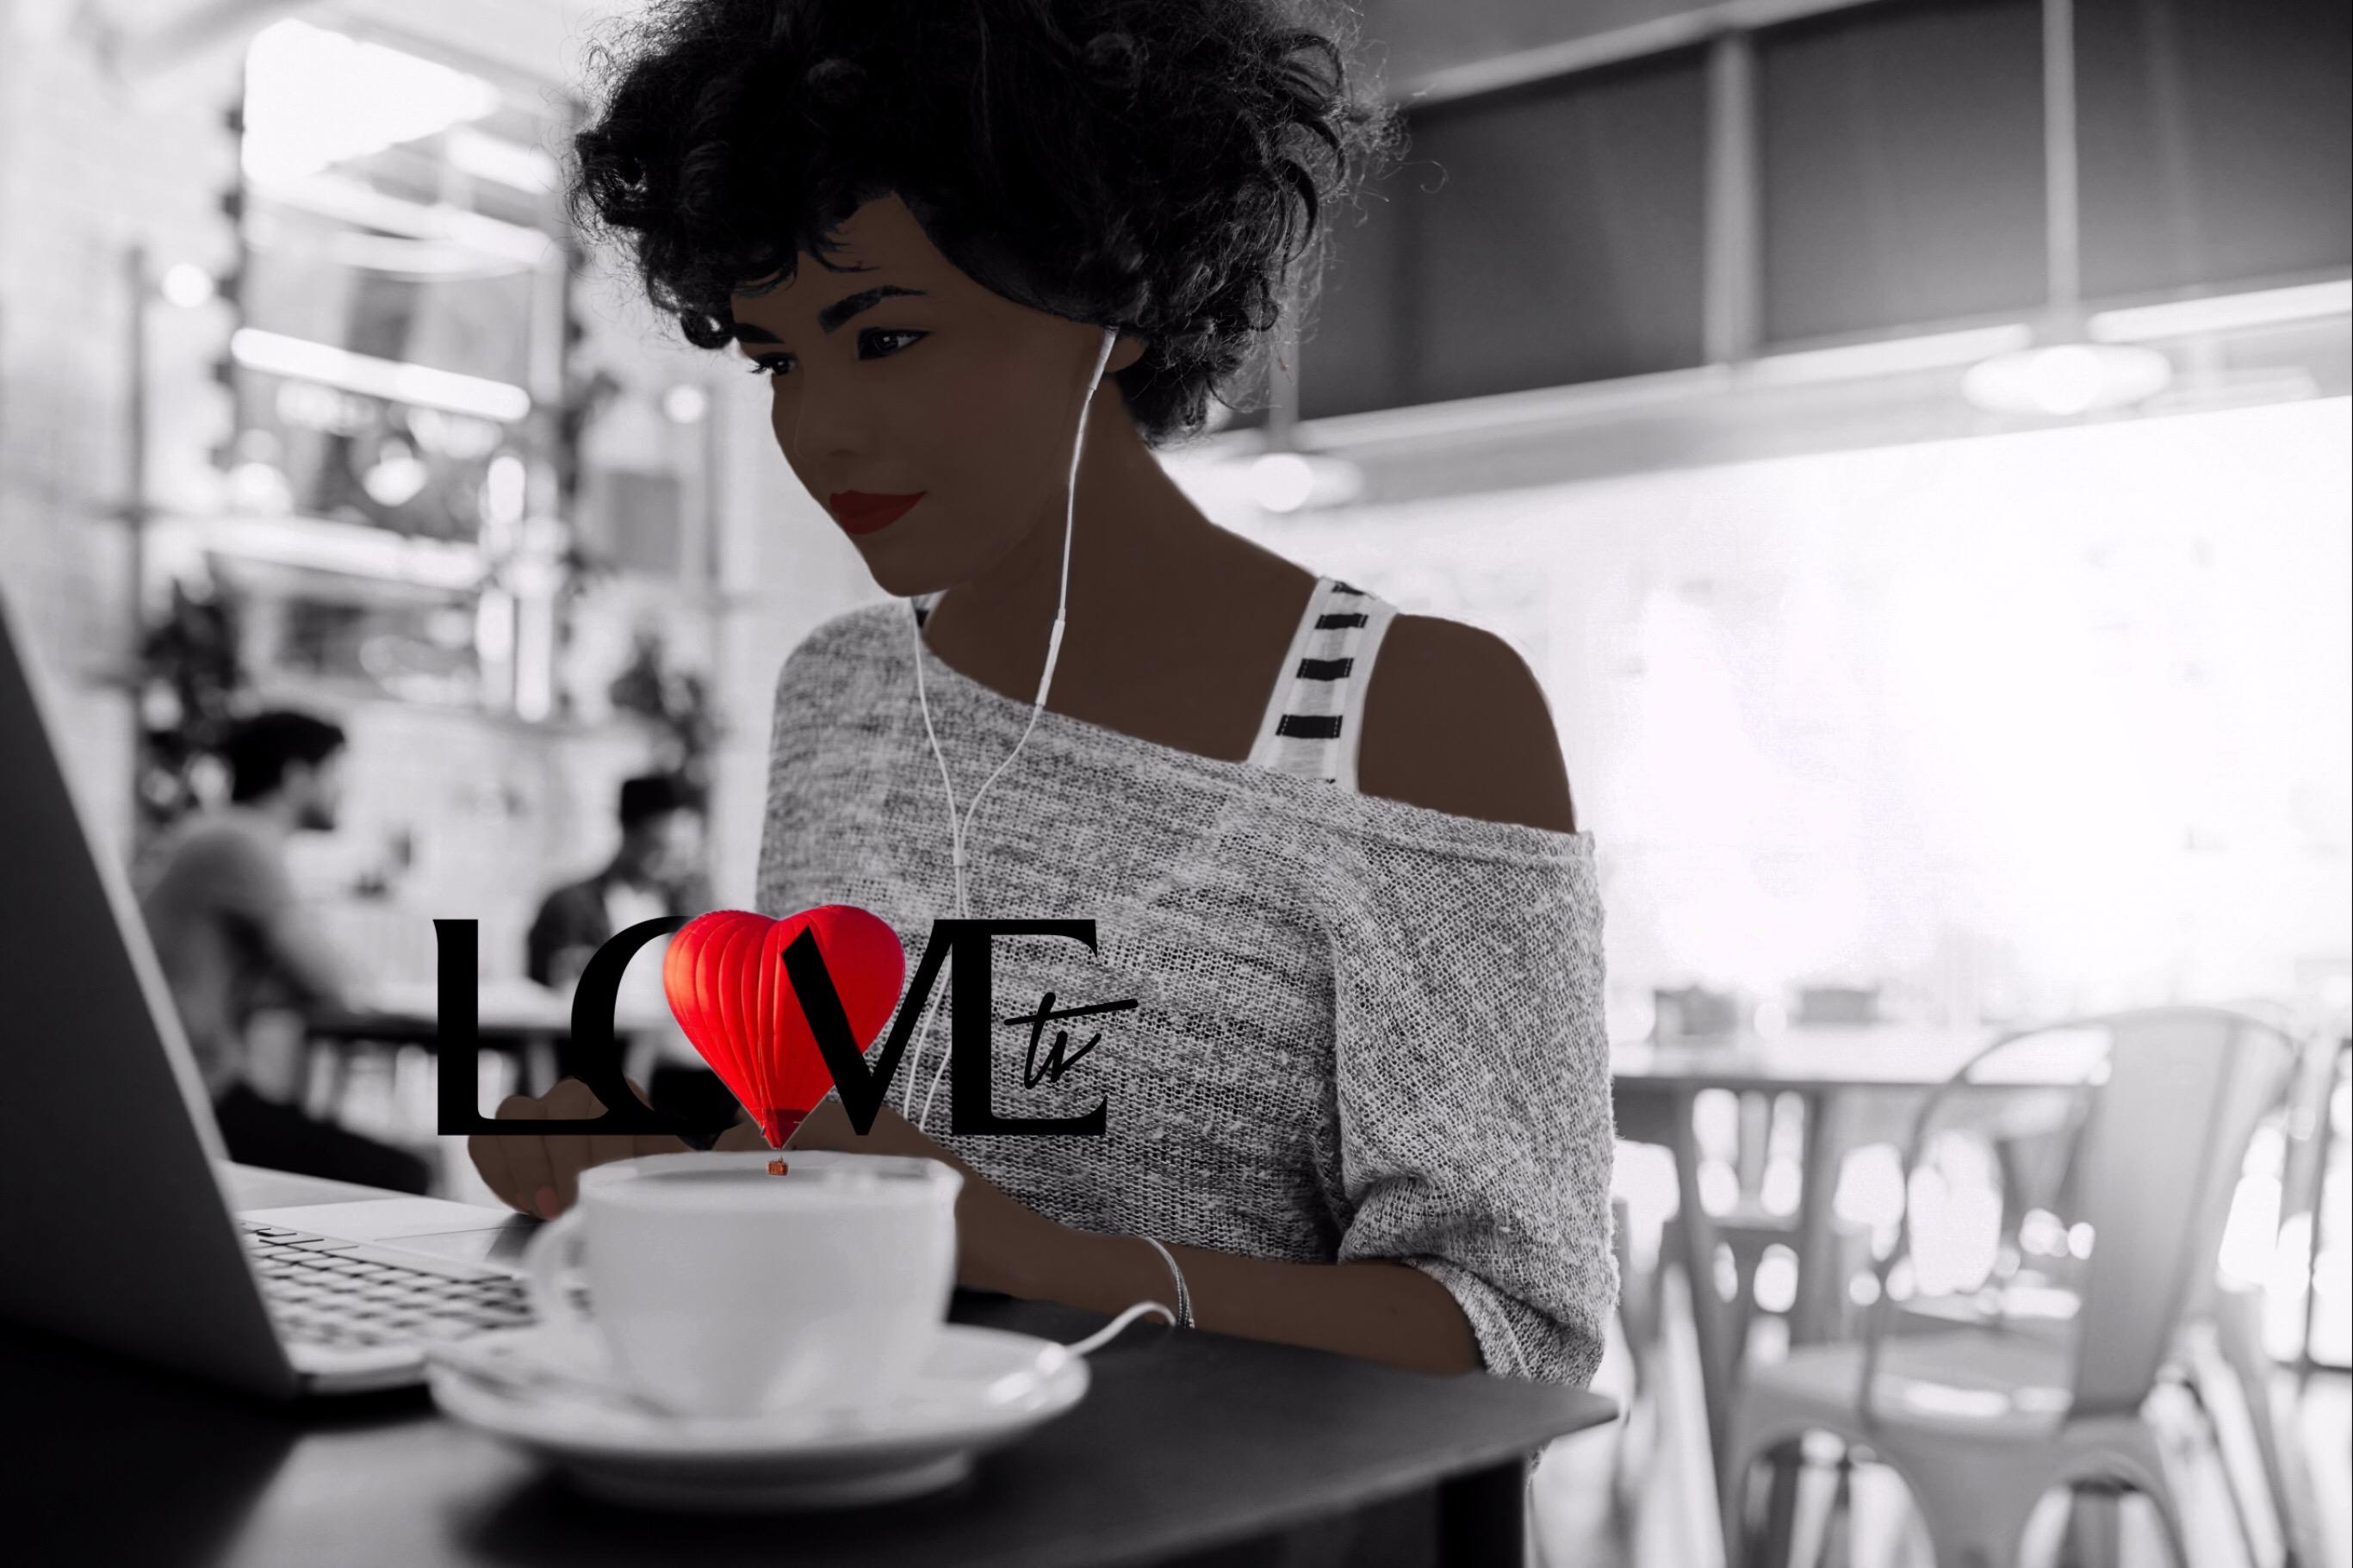 #freetoedit #eclovetv #draw #minimal #lovely #madewithpicsart #picsart #lovetv @picsart @lovetv